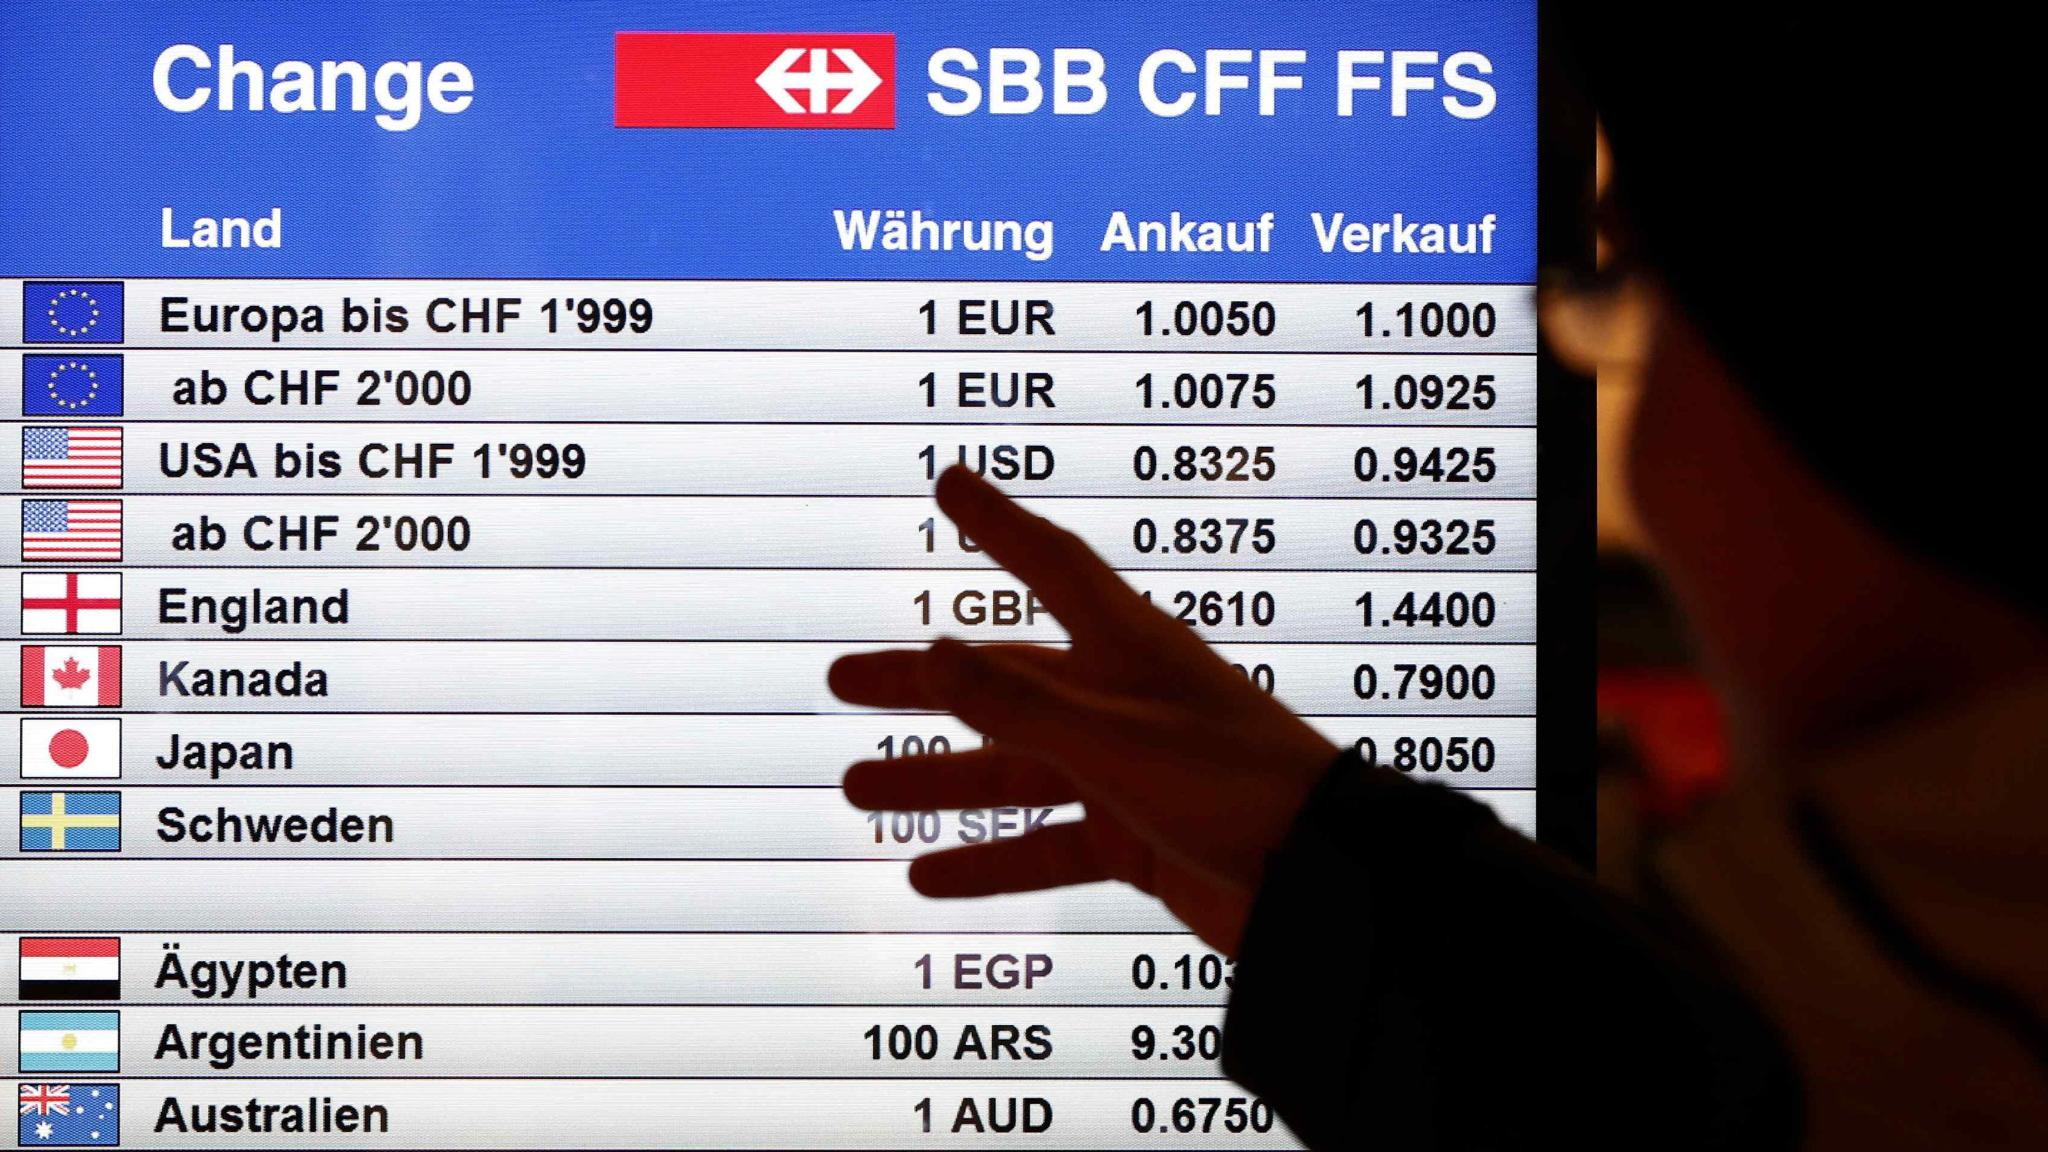 forex broker australien binäre option indonesien 2021